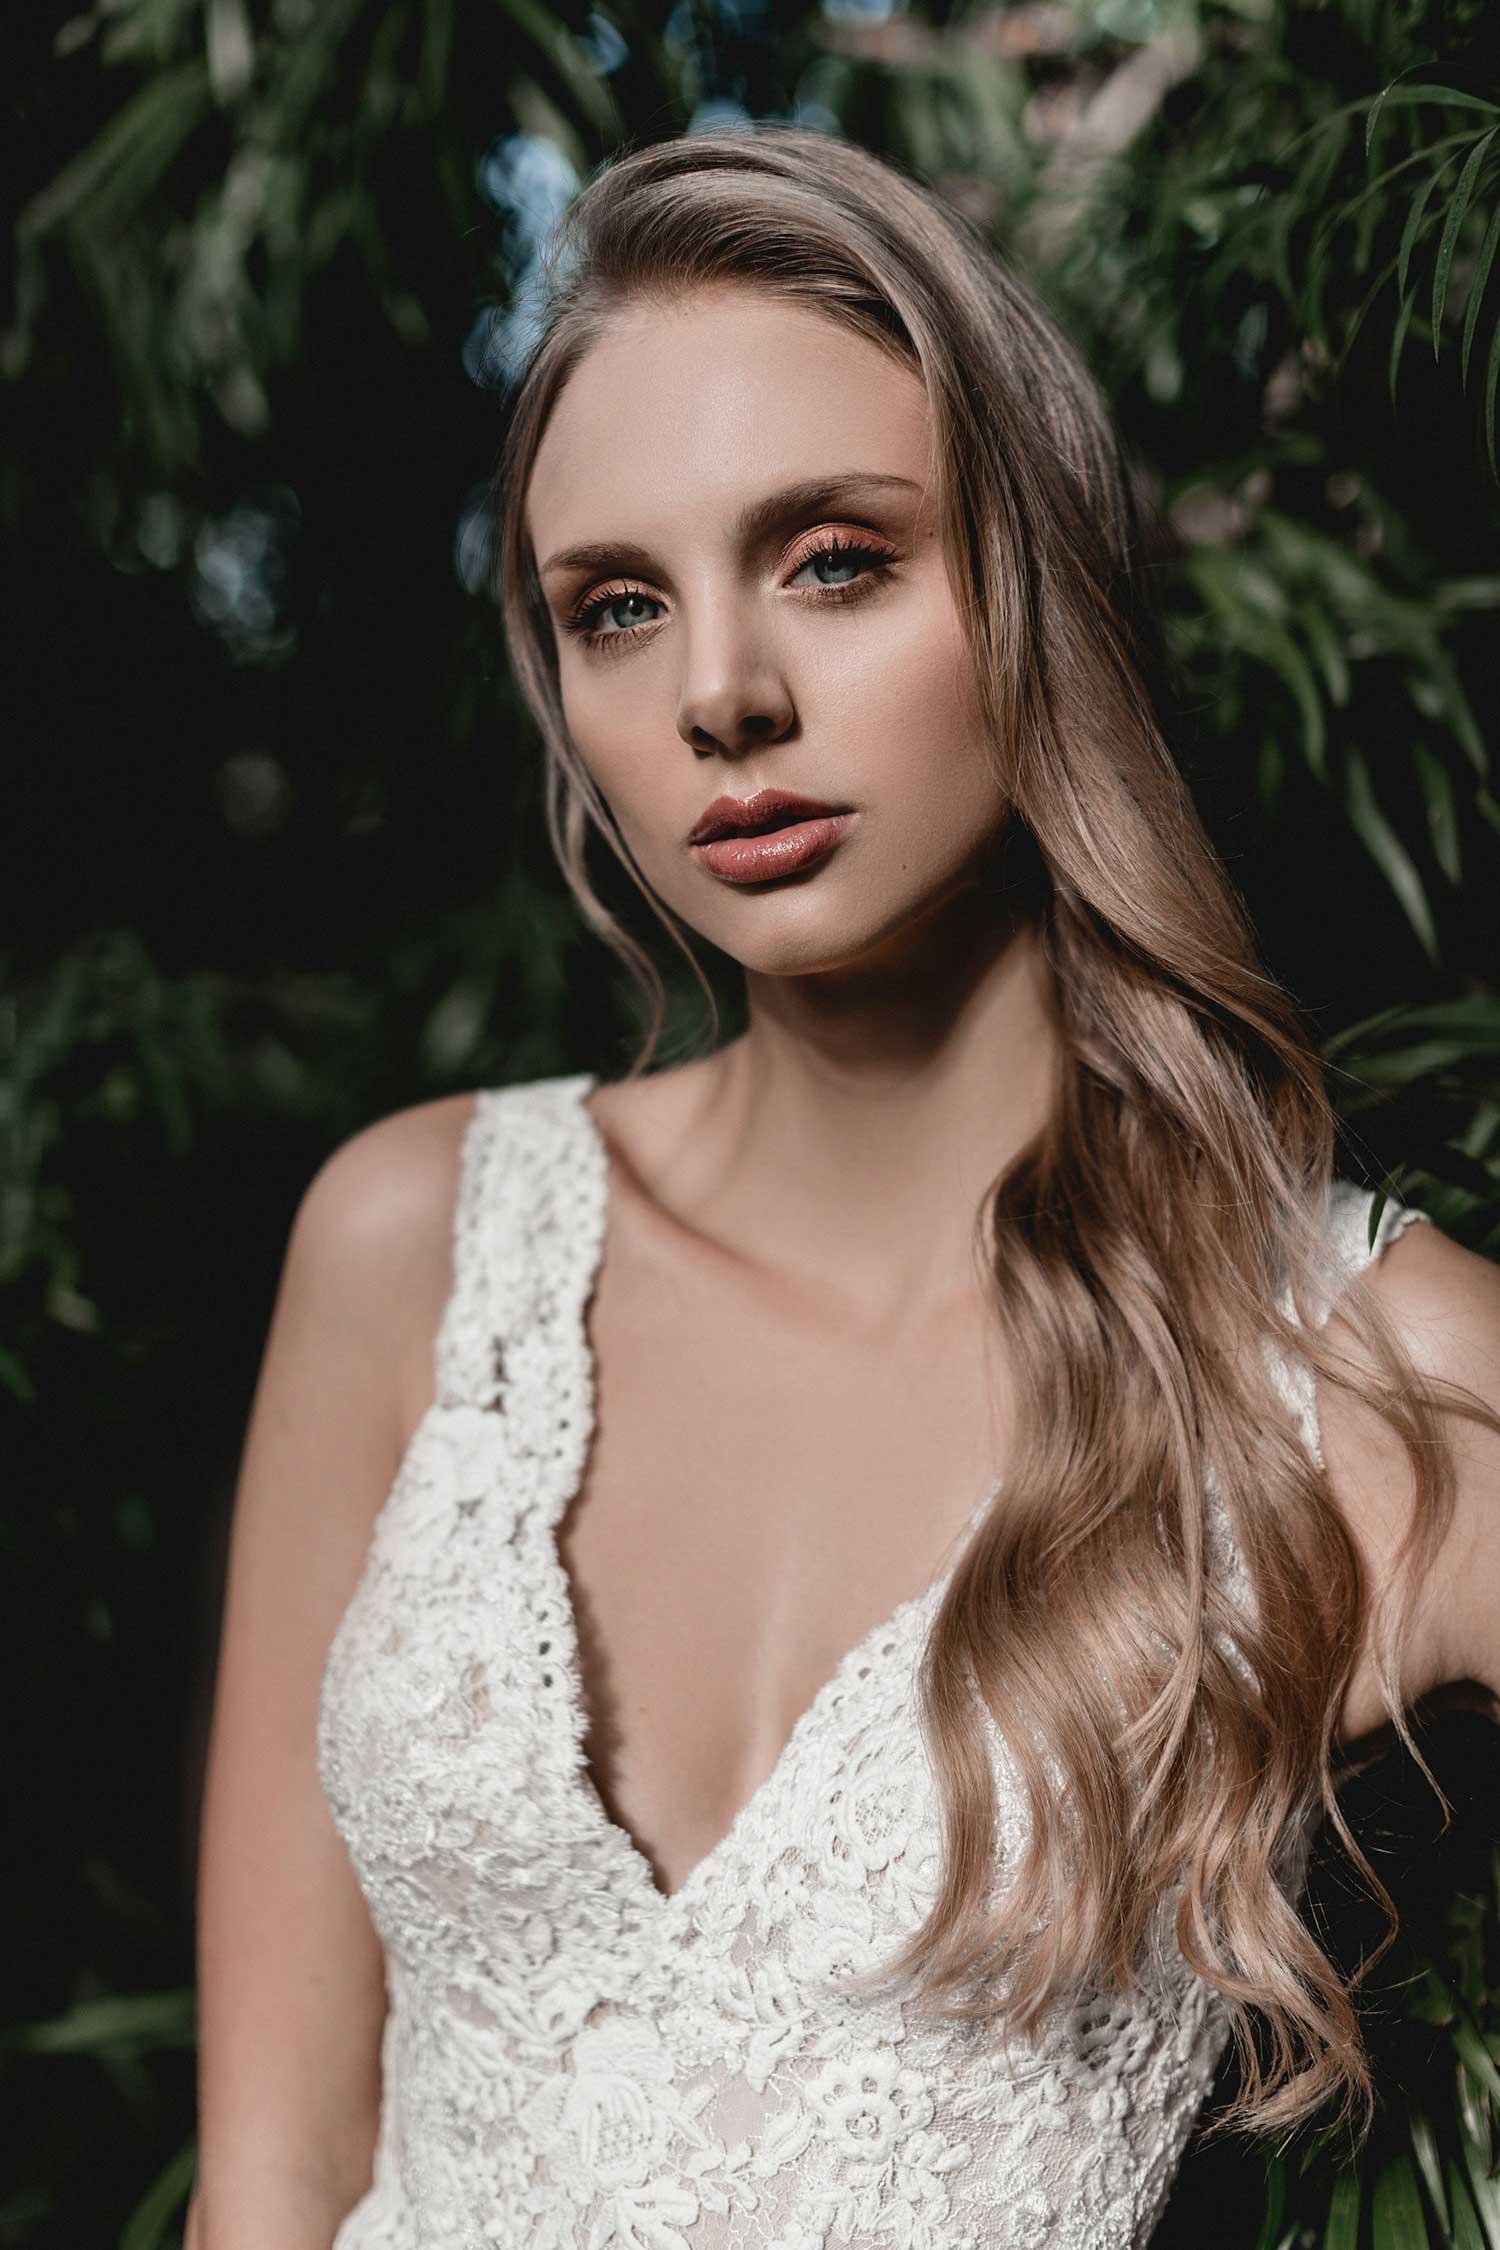 Beautiful portrait of the bridal model